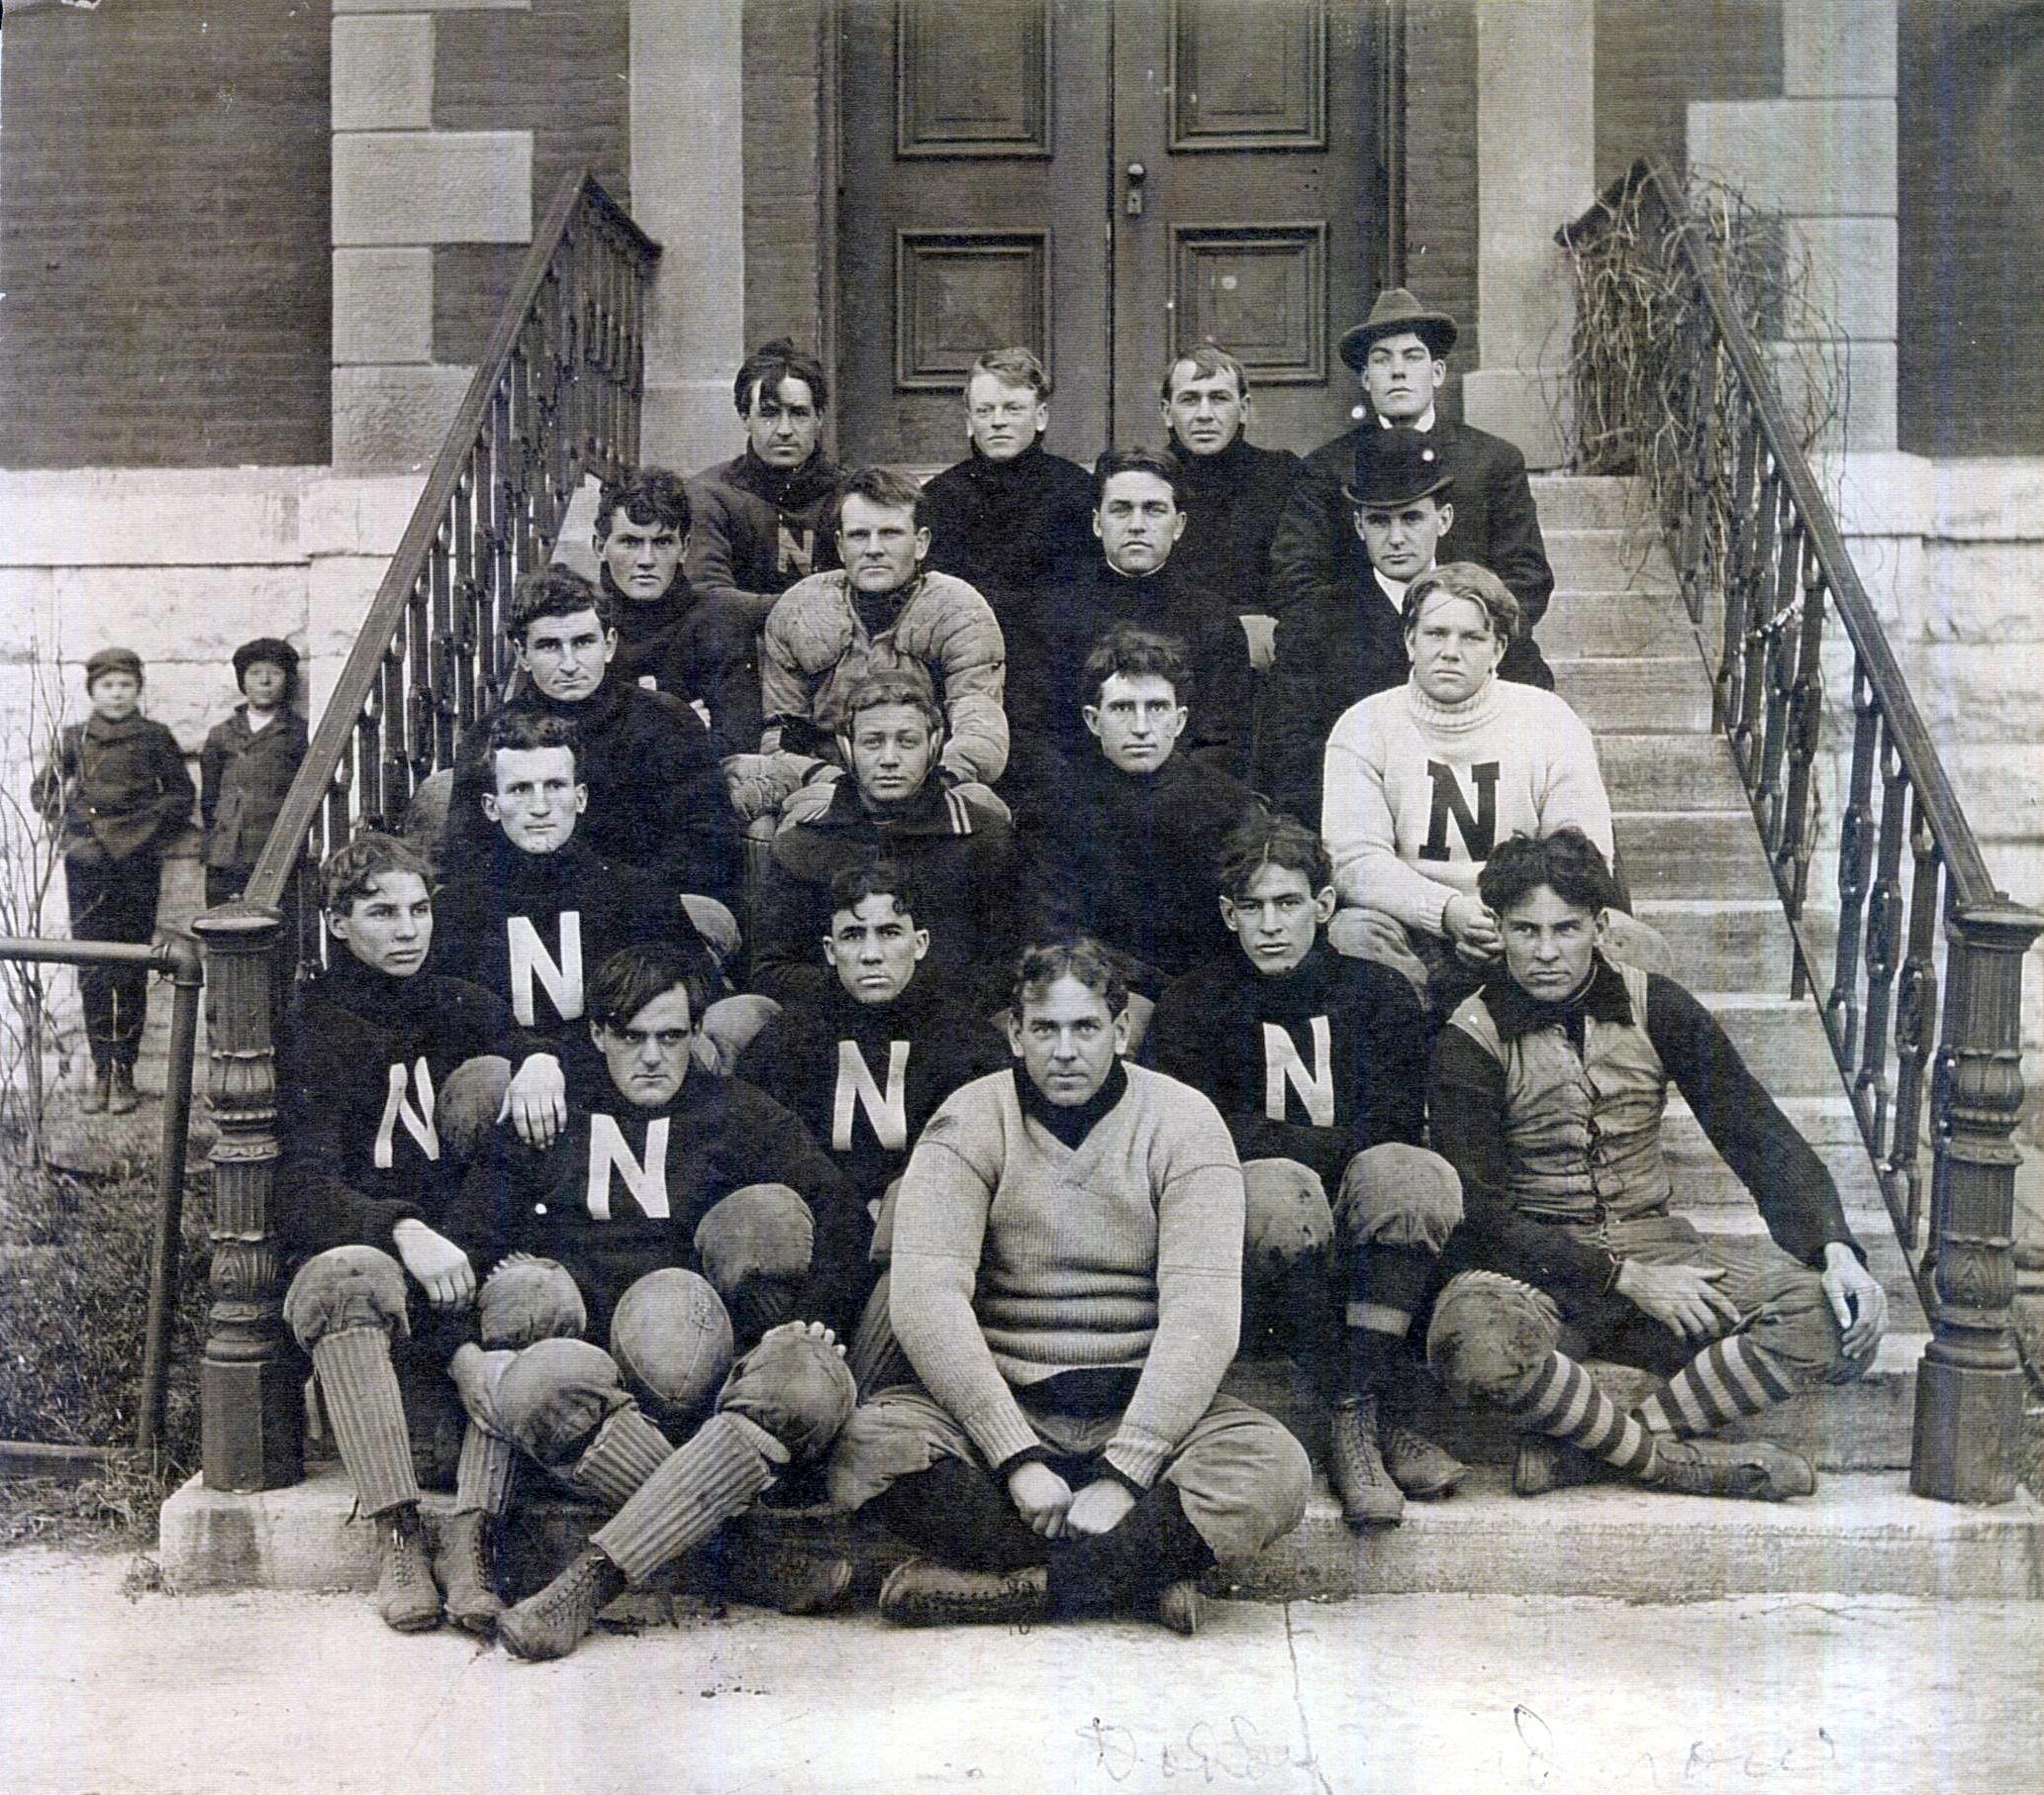 1a34bec62 1901 Nebraska Cornhuskers football team - Wikipedia